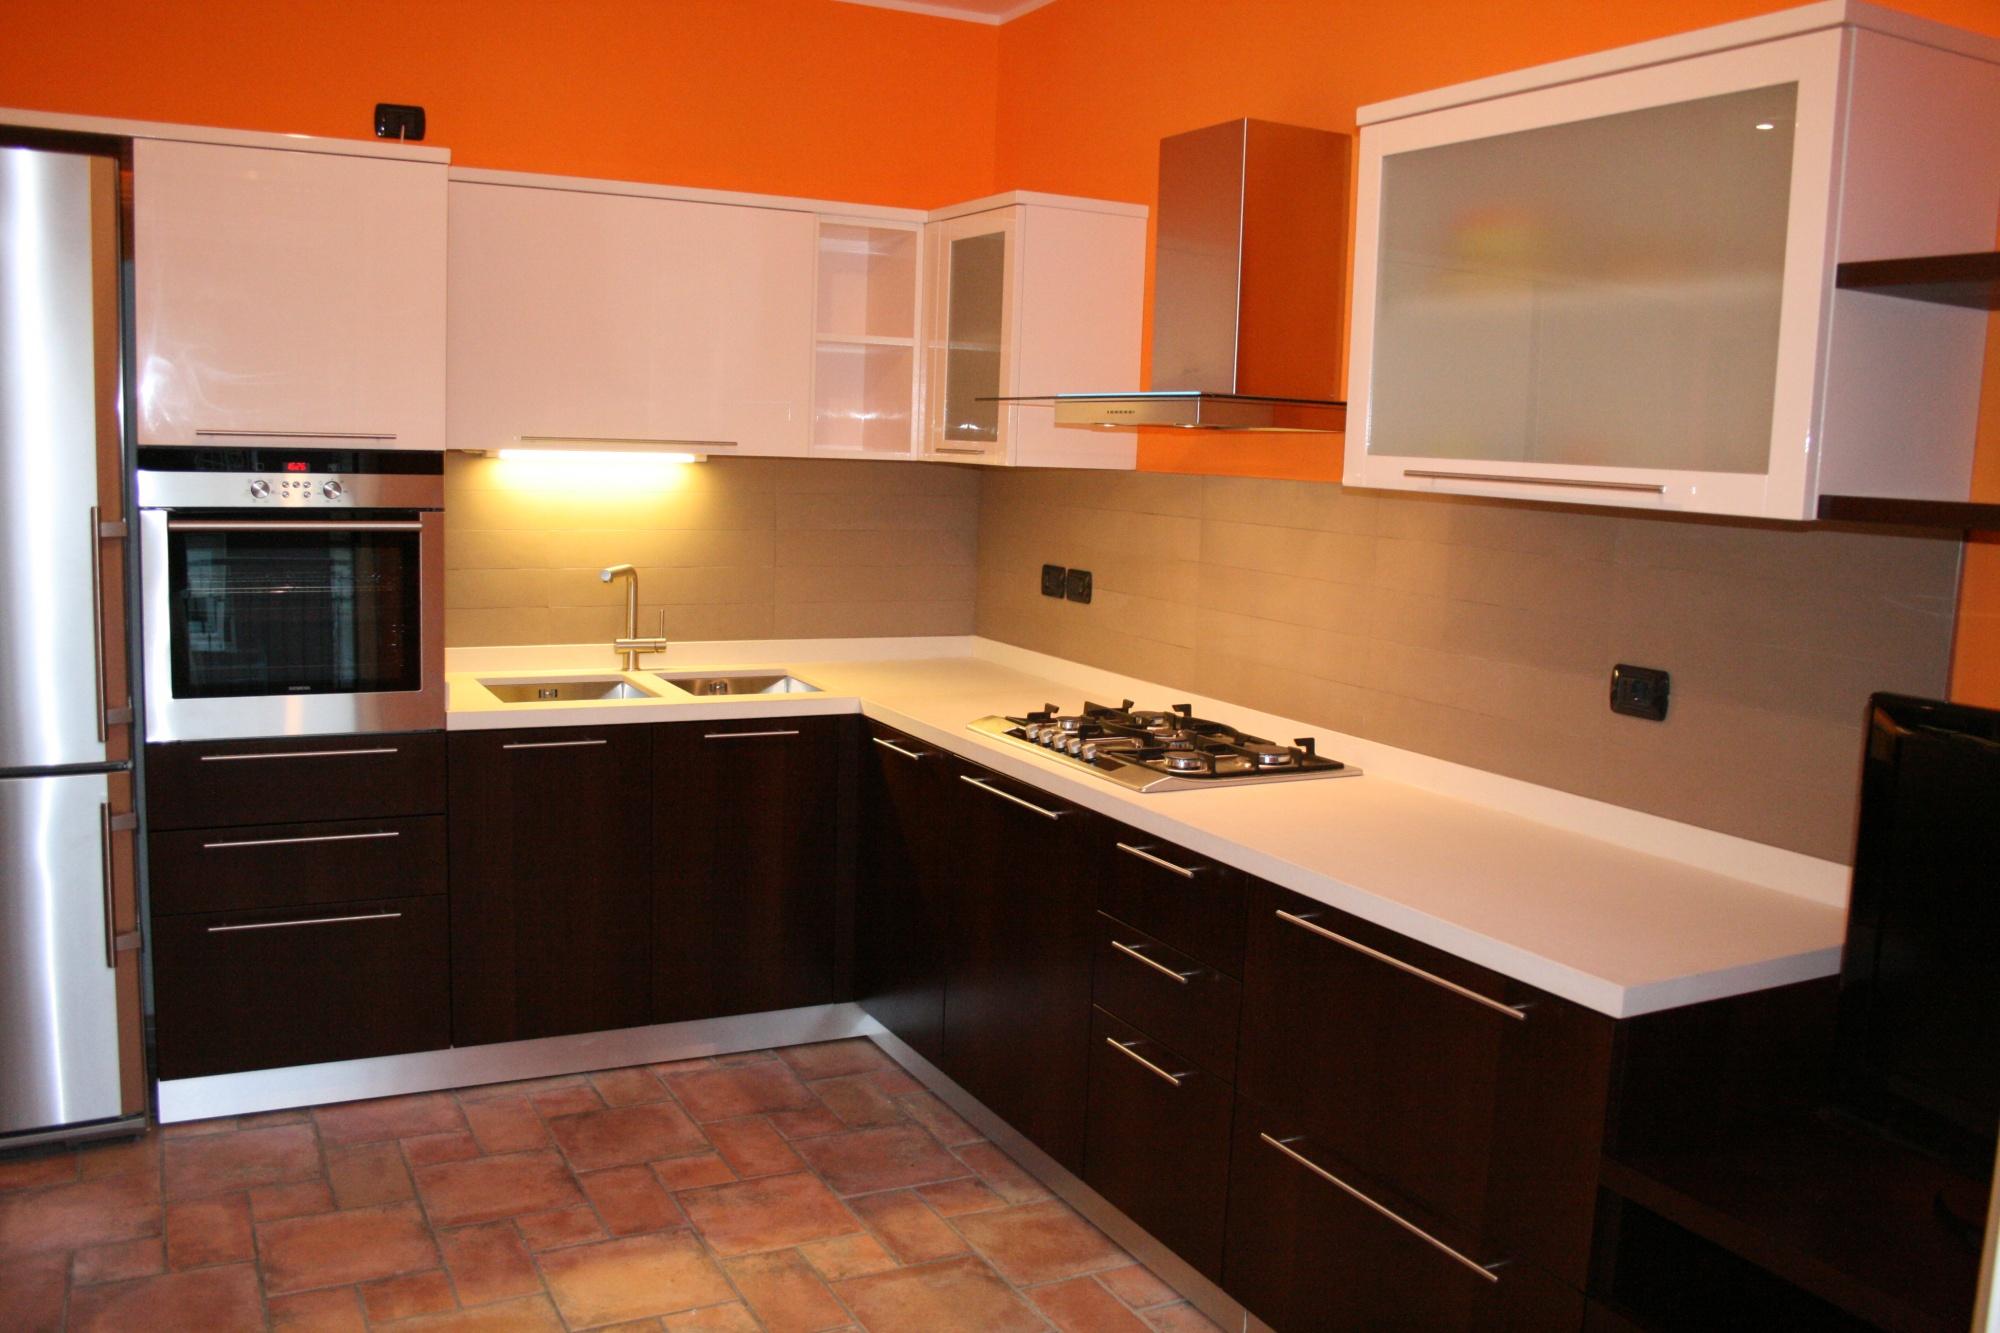 Cucine Lube Alessandria : Cucina bianca e bordeaux awesome modrio cm